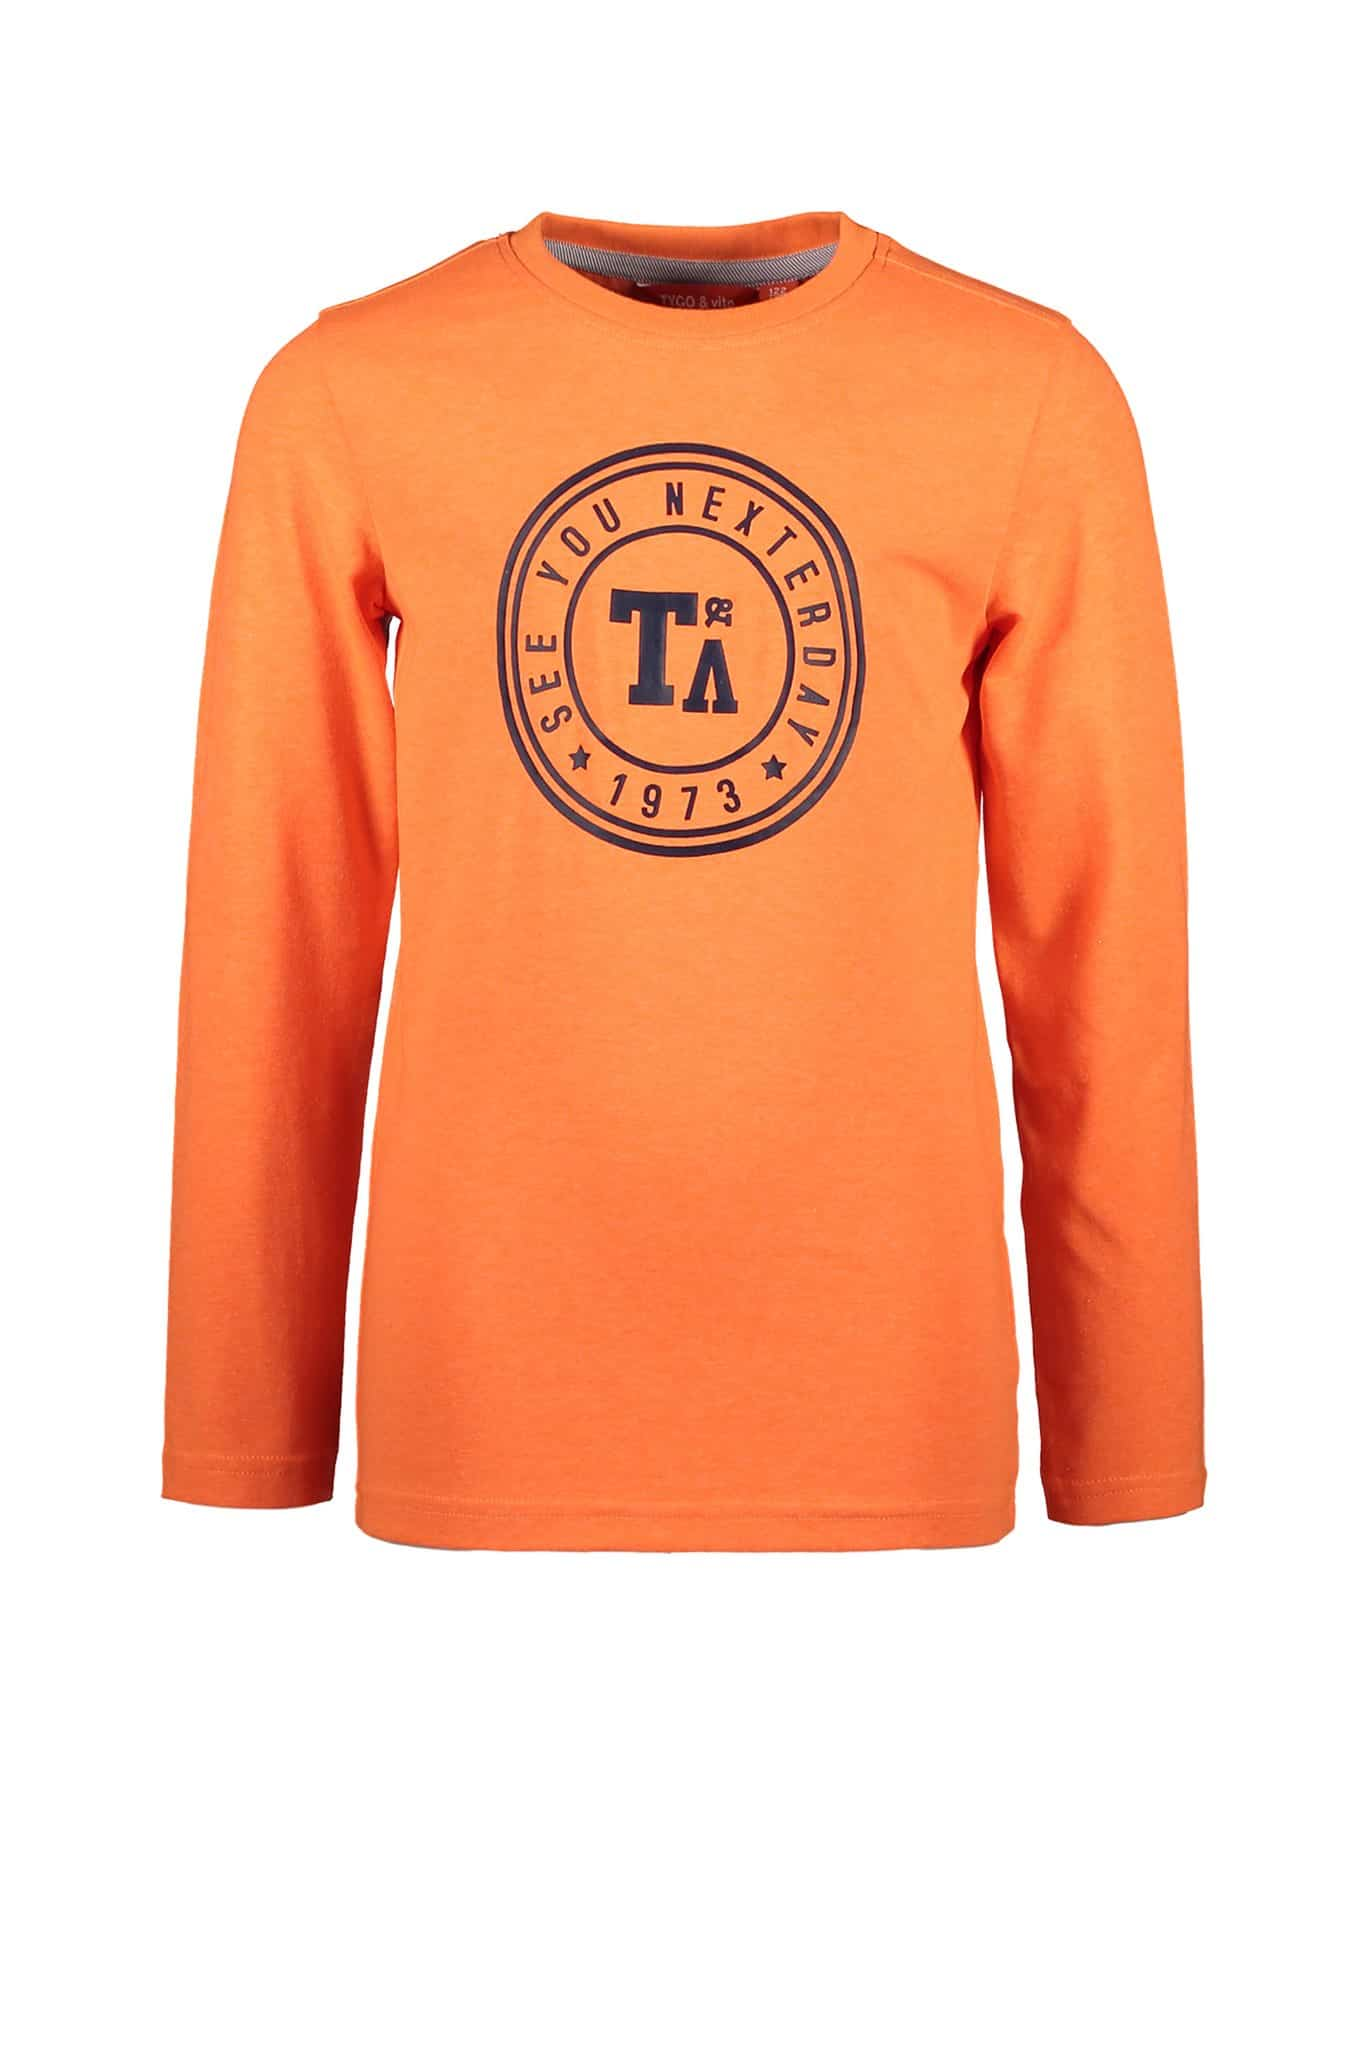 Tygo & Vito LS Oranje Logo